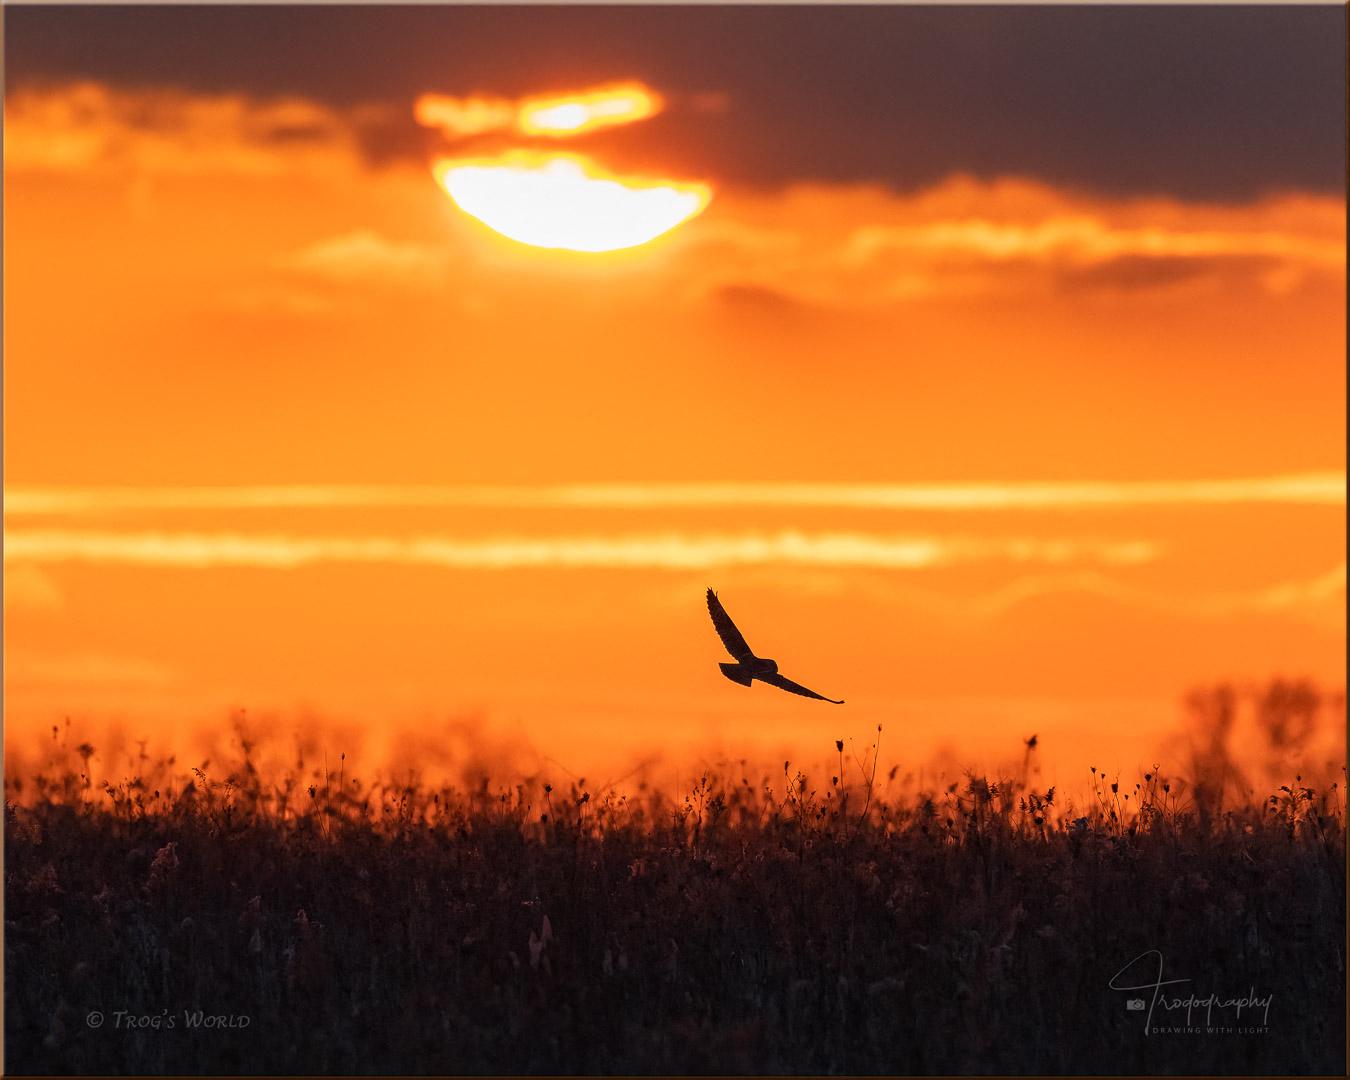 Short-eared Owl in flight during sunset